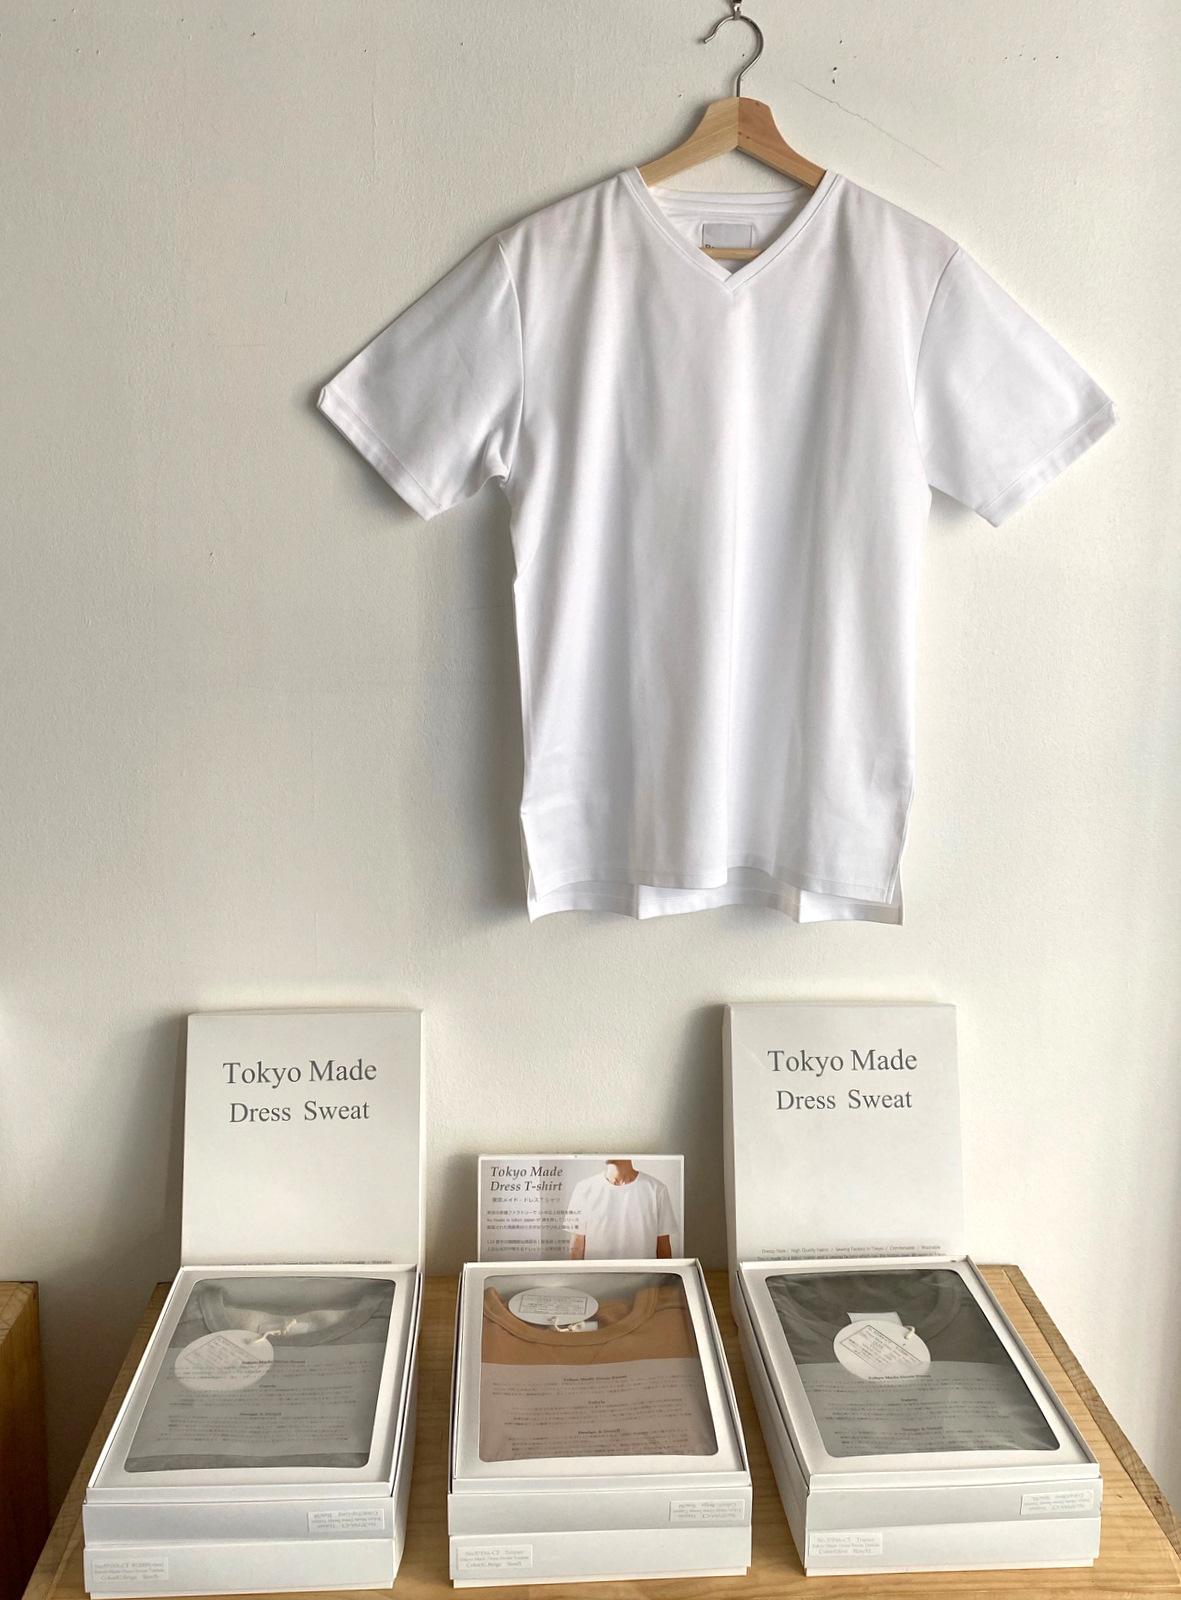 Tokyo Made Dress T-shirt (V-neck)_c0379477_08000827.jpg